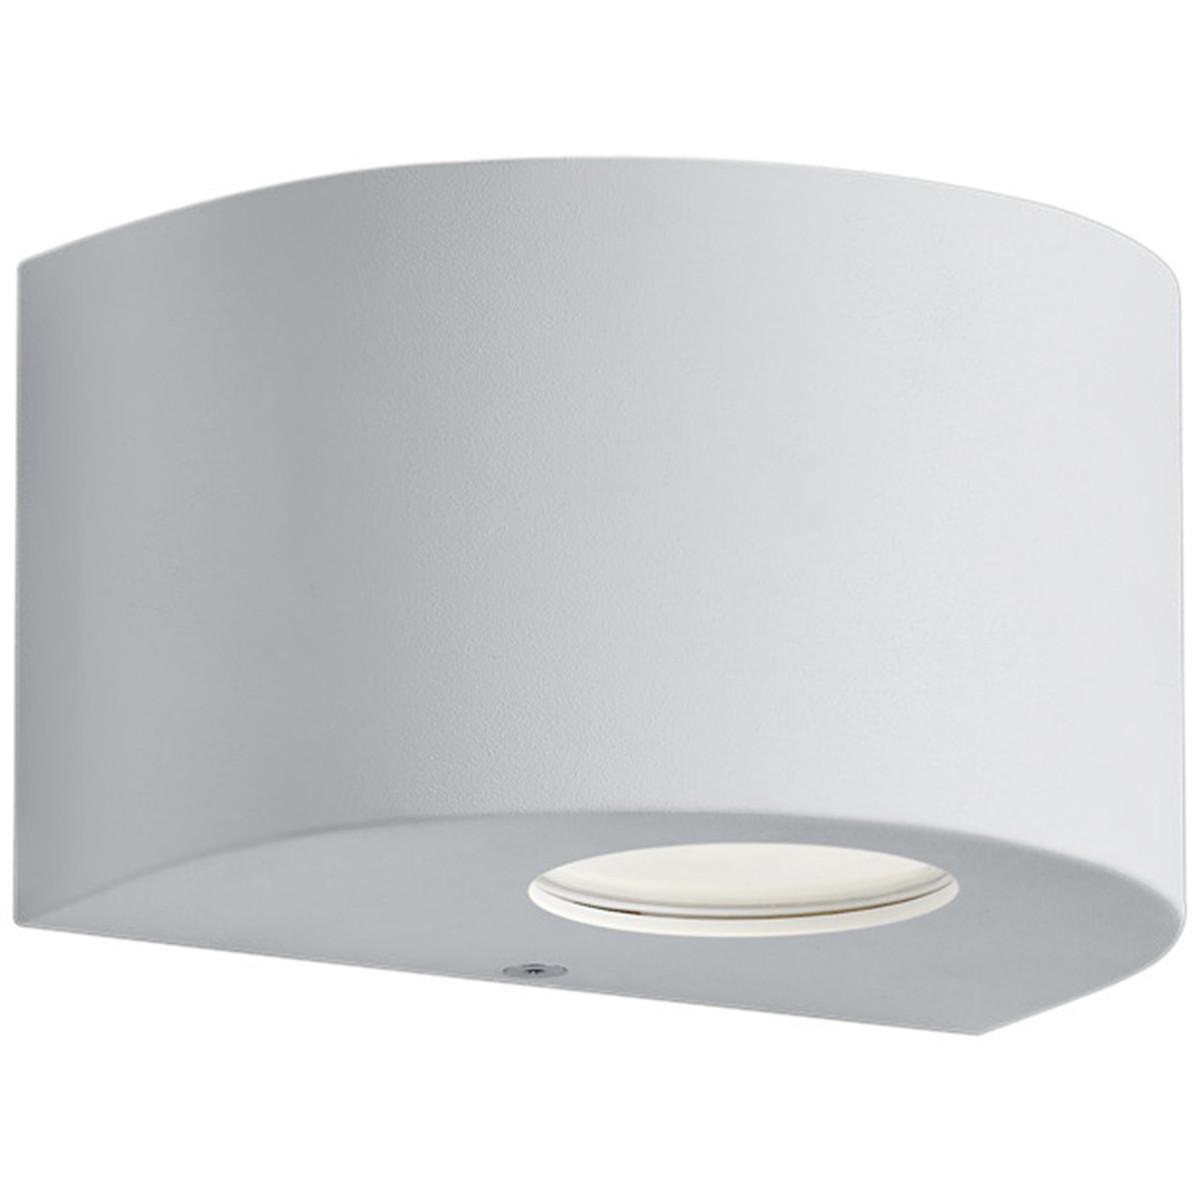 LED Tuinverlichting - Tuinlamp - Trion Rosina - Wand - 4W - Mat Wit - Kunststof